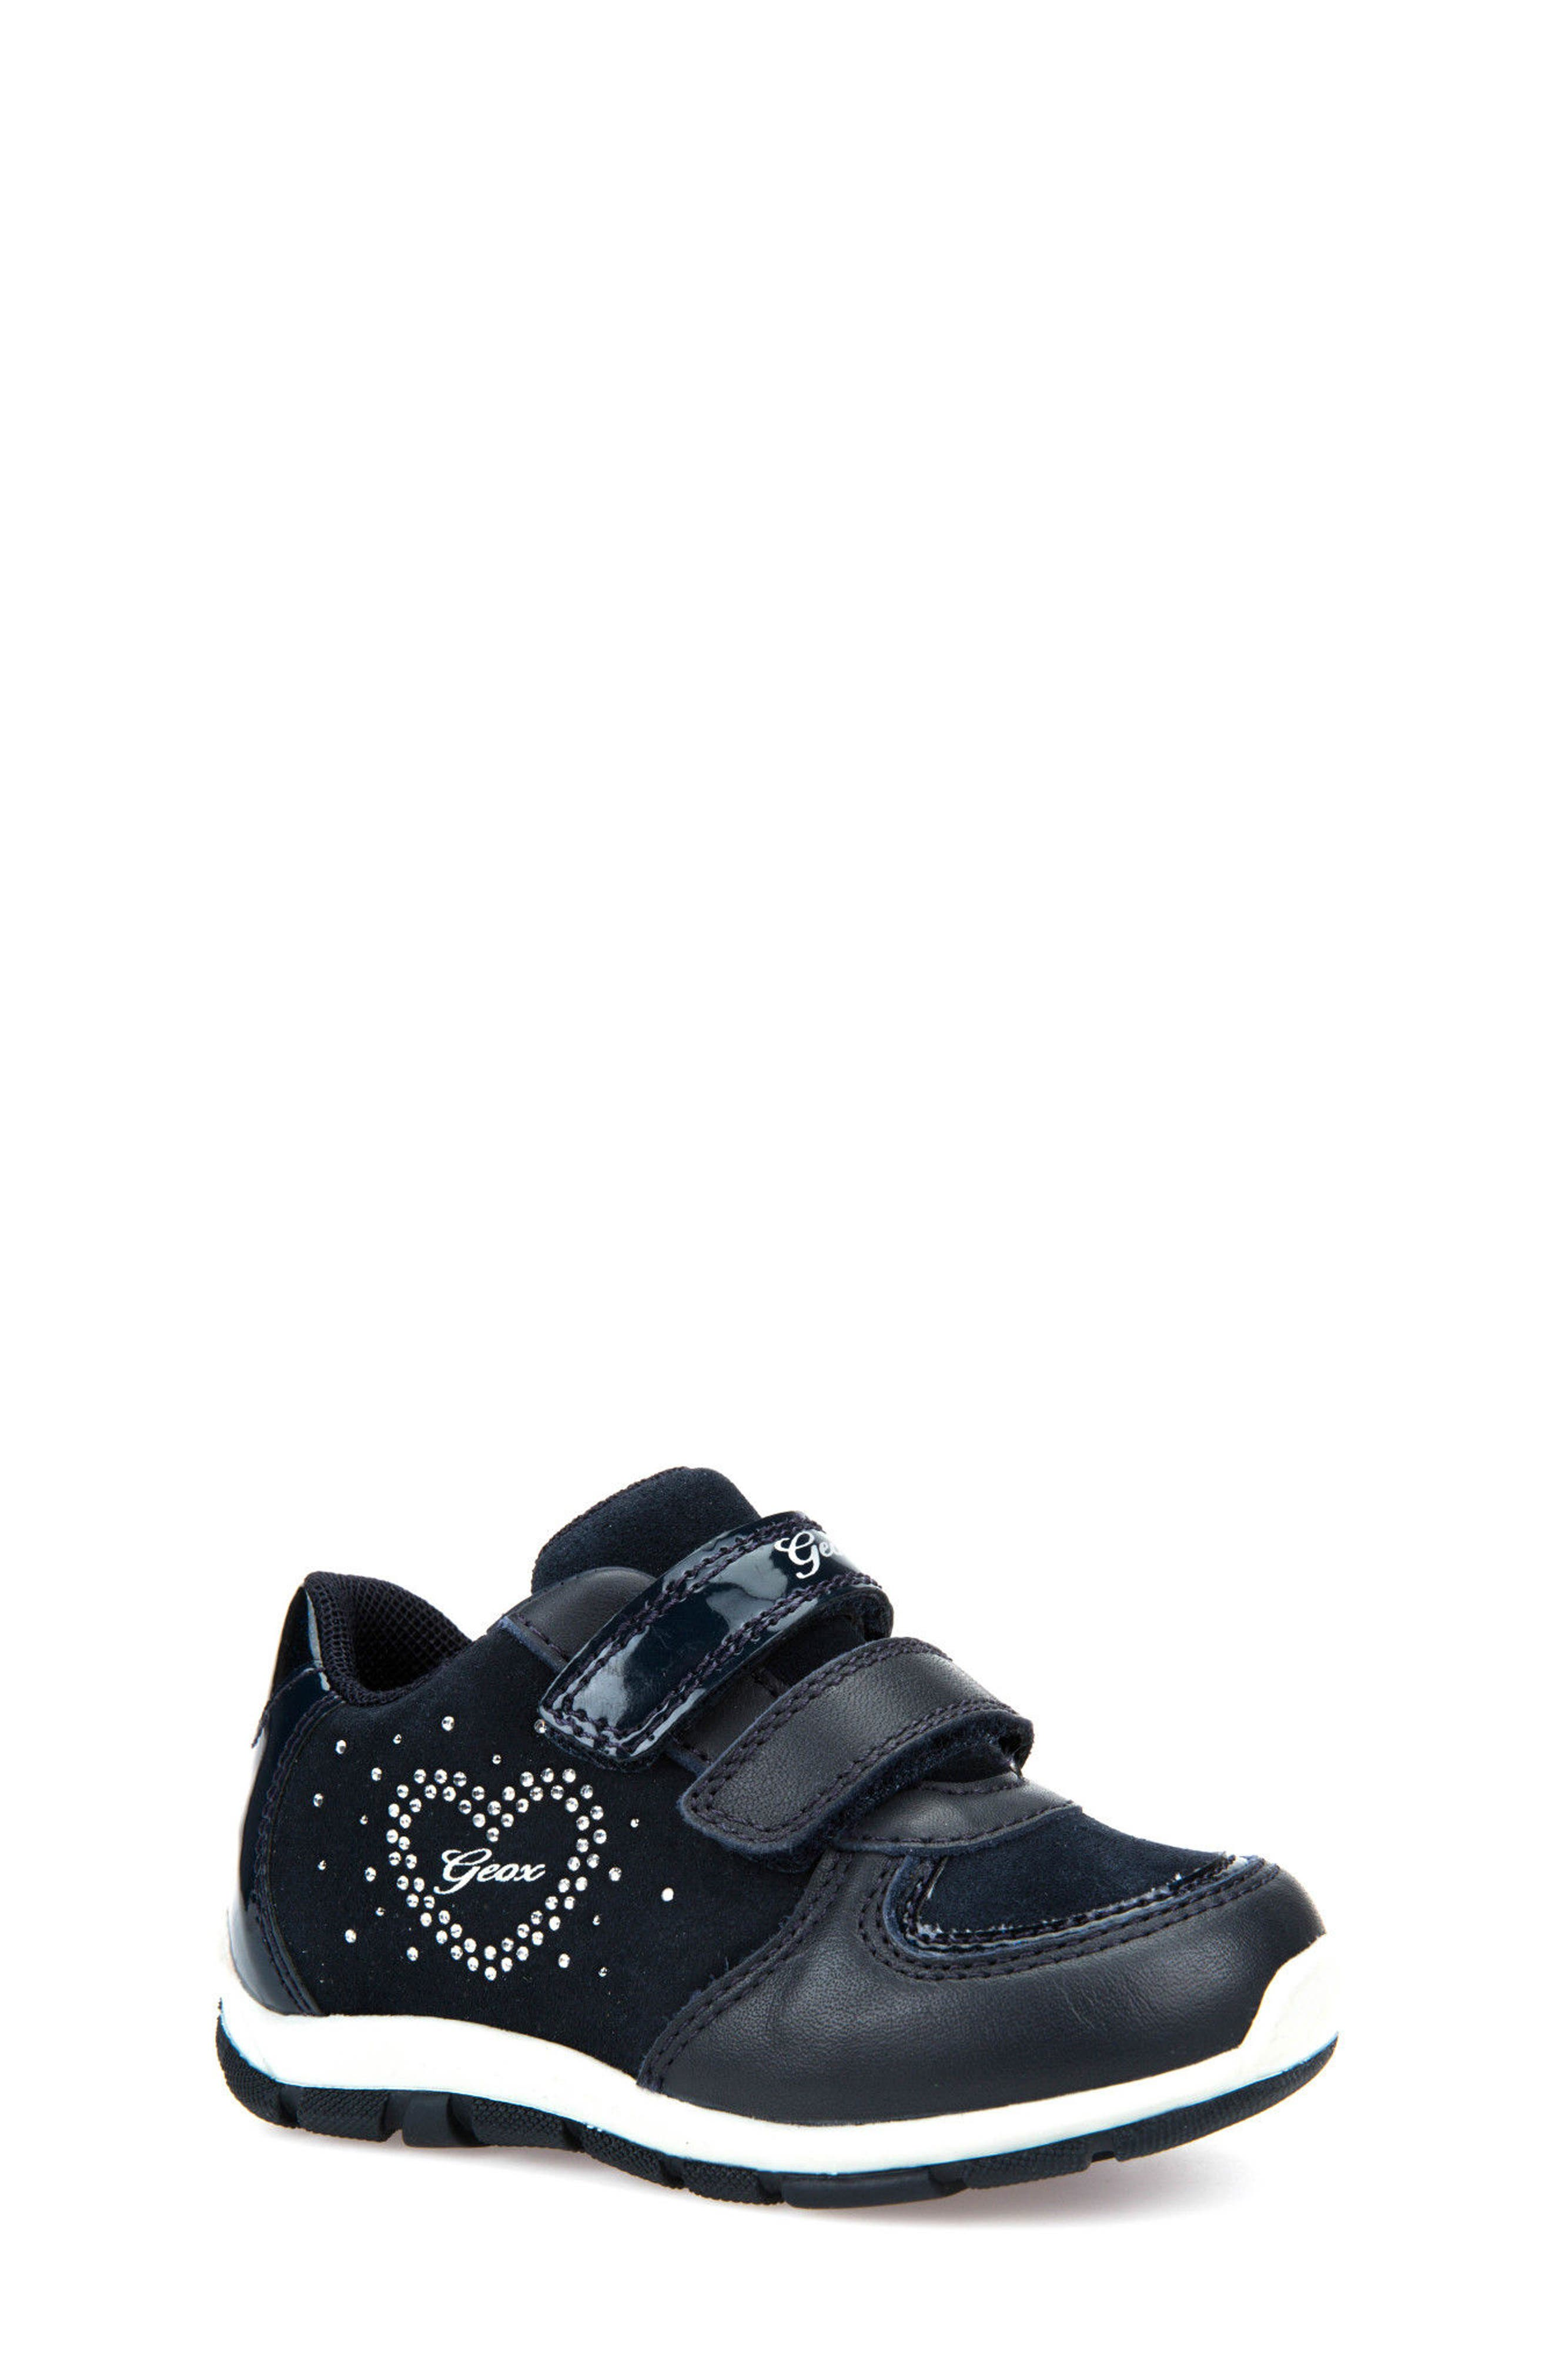 Main Image - Geox Shaax Love Sneaker (Walker & Toddler)